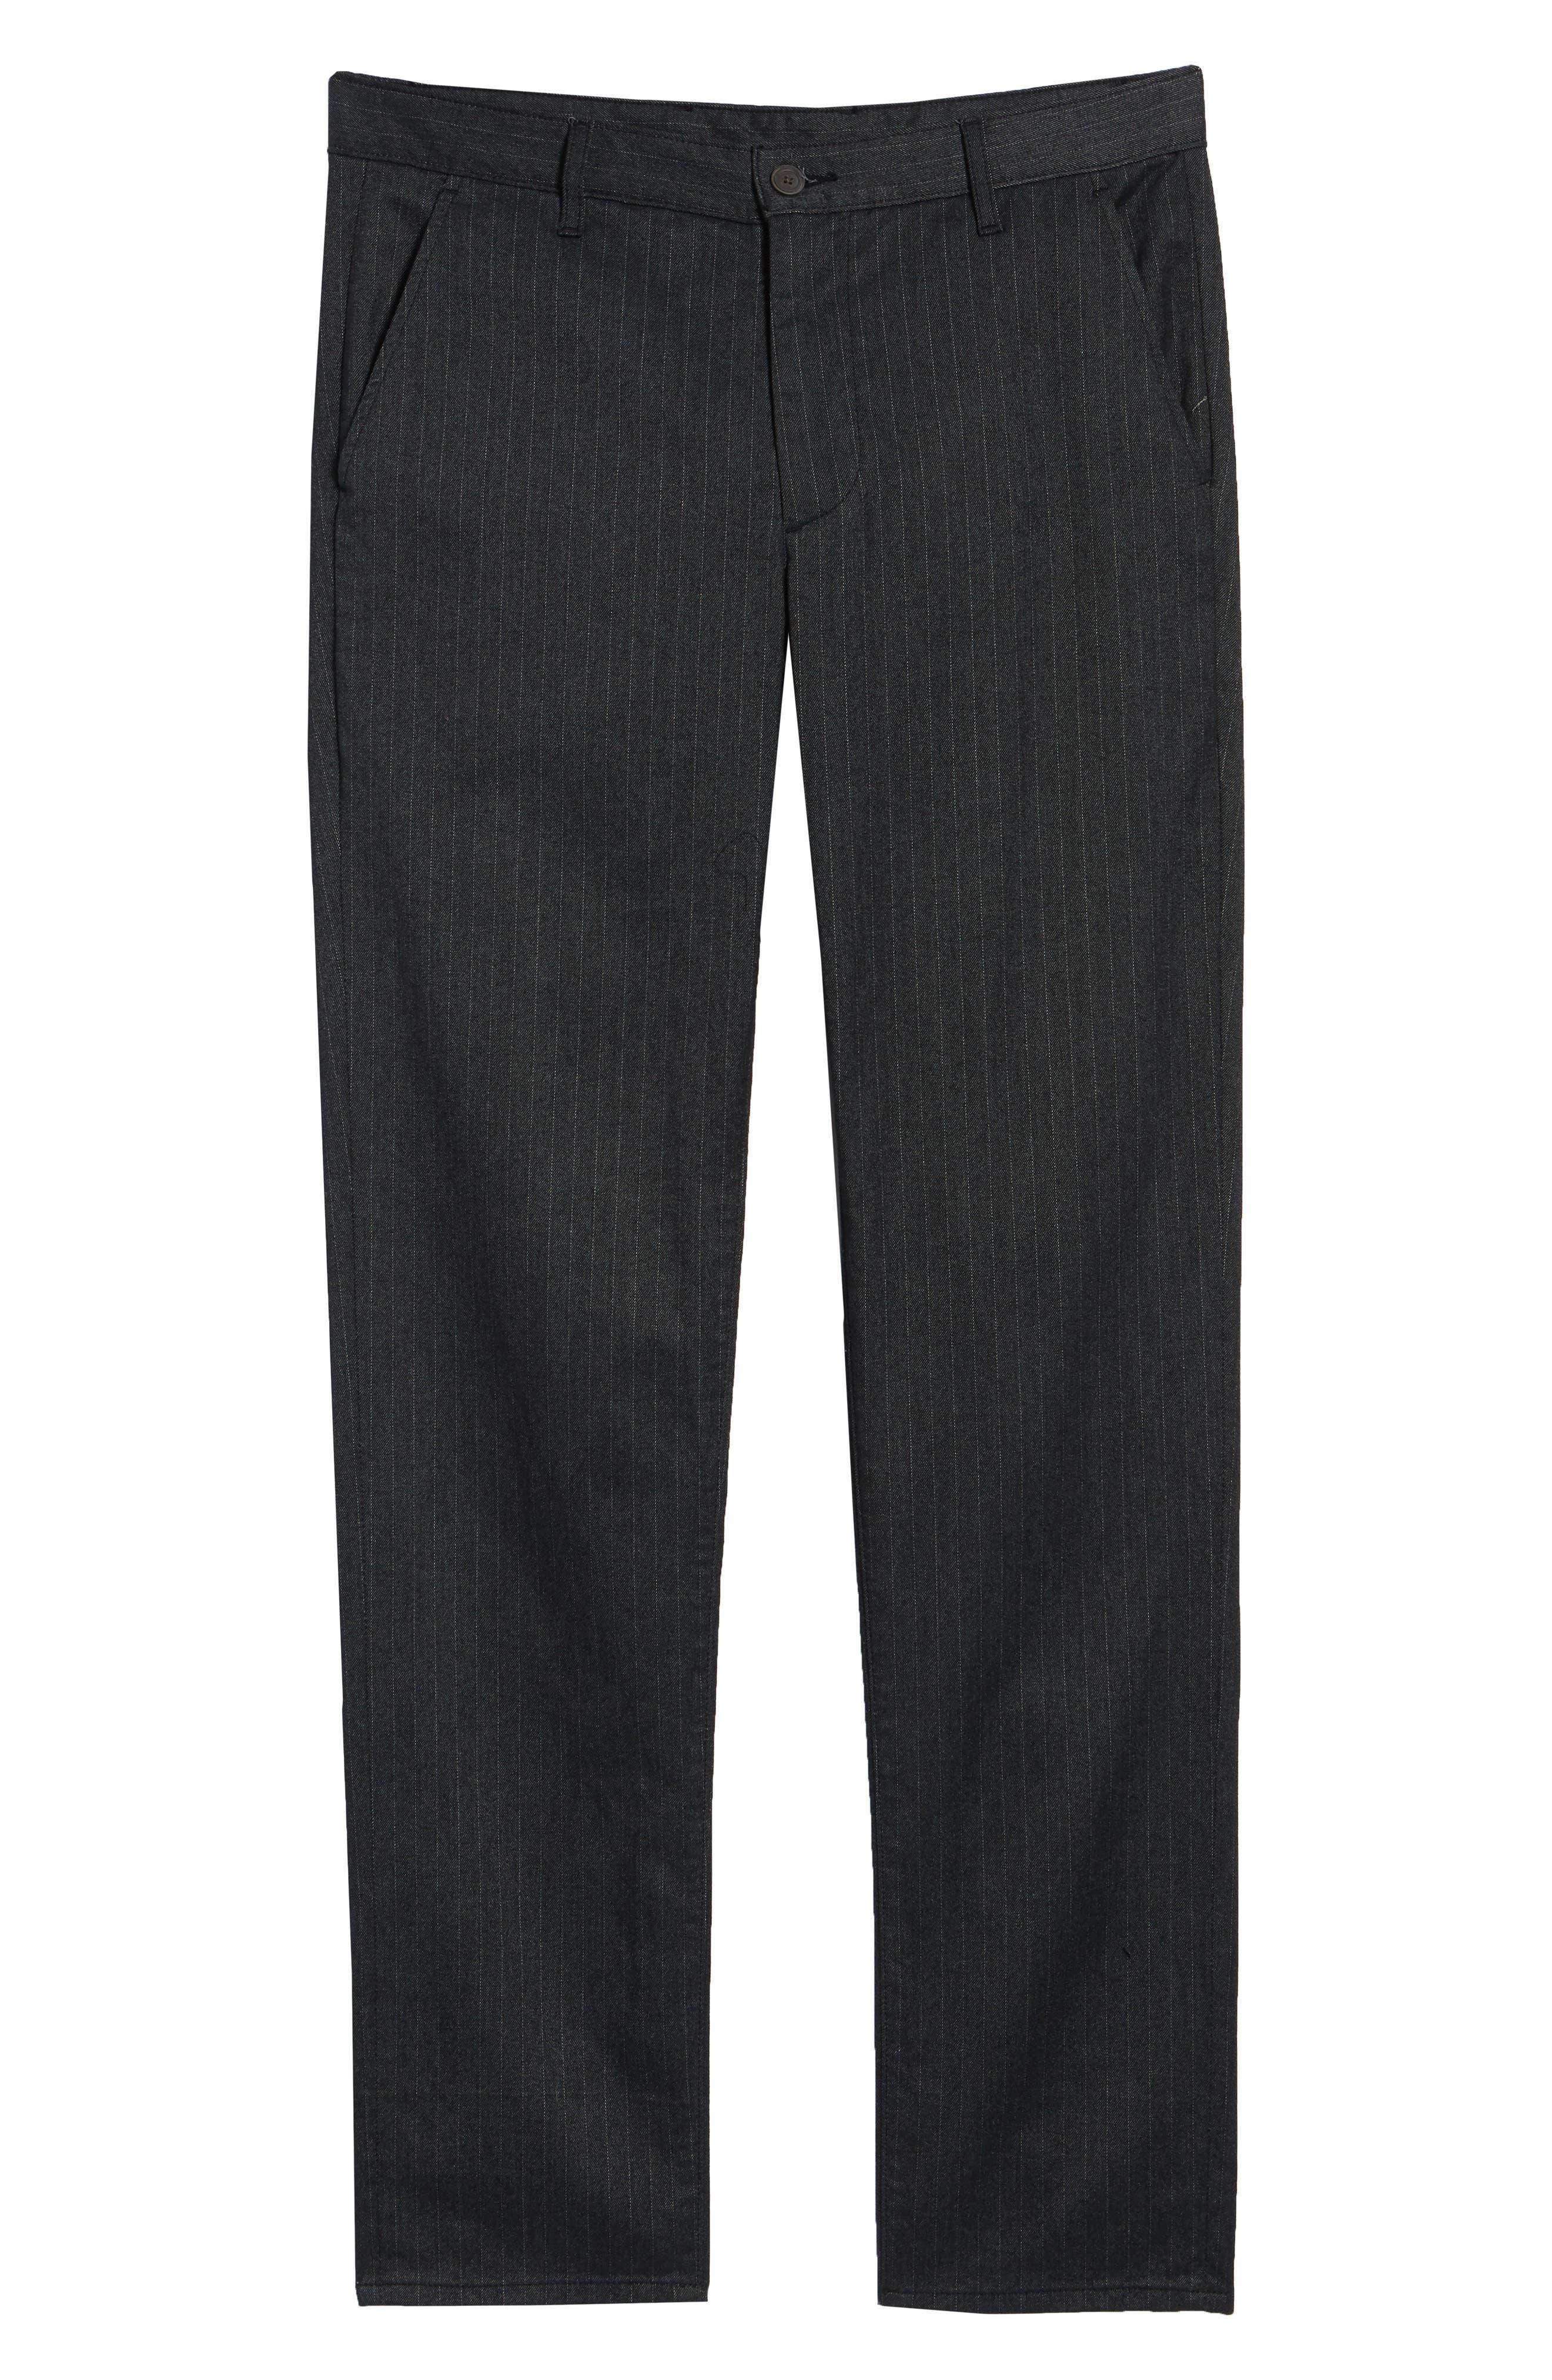 Marshall Slim Fit Pinstripe Pants,                             Alternate thumbnail 6, color,                             HEATHERED MELANGE BLACK